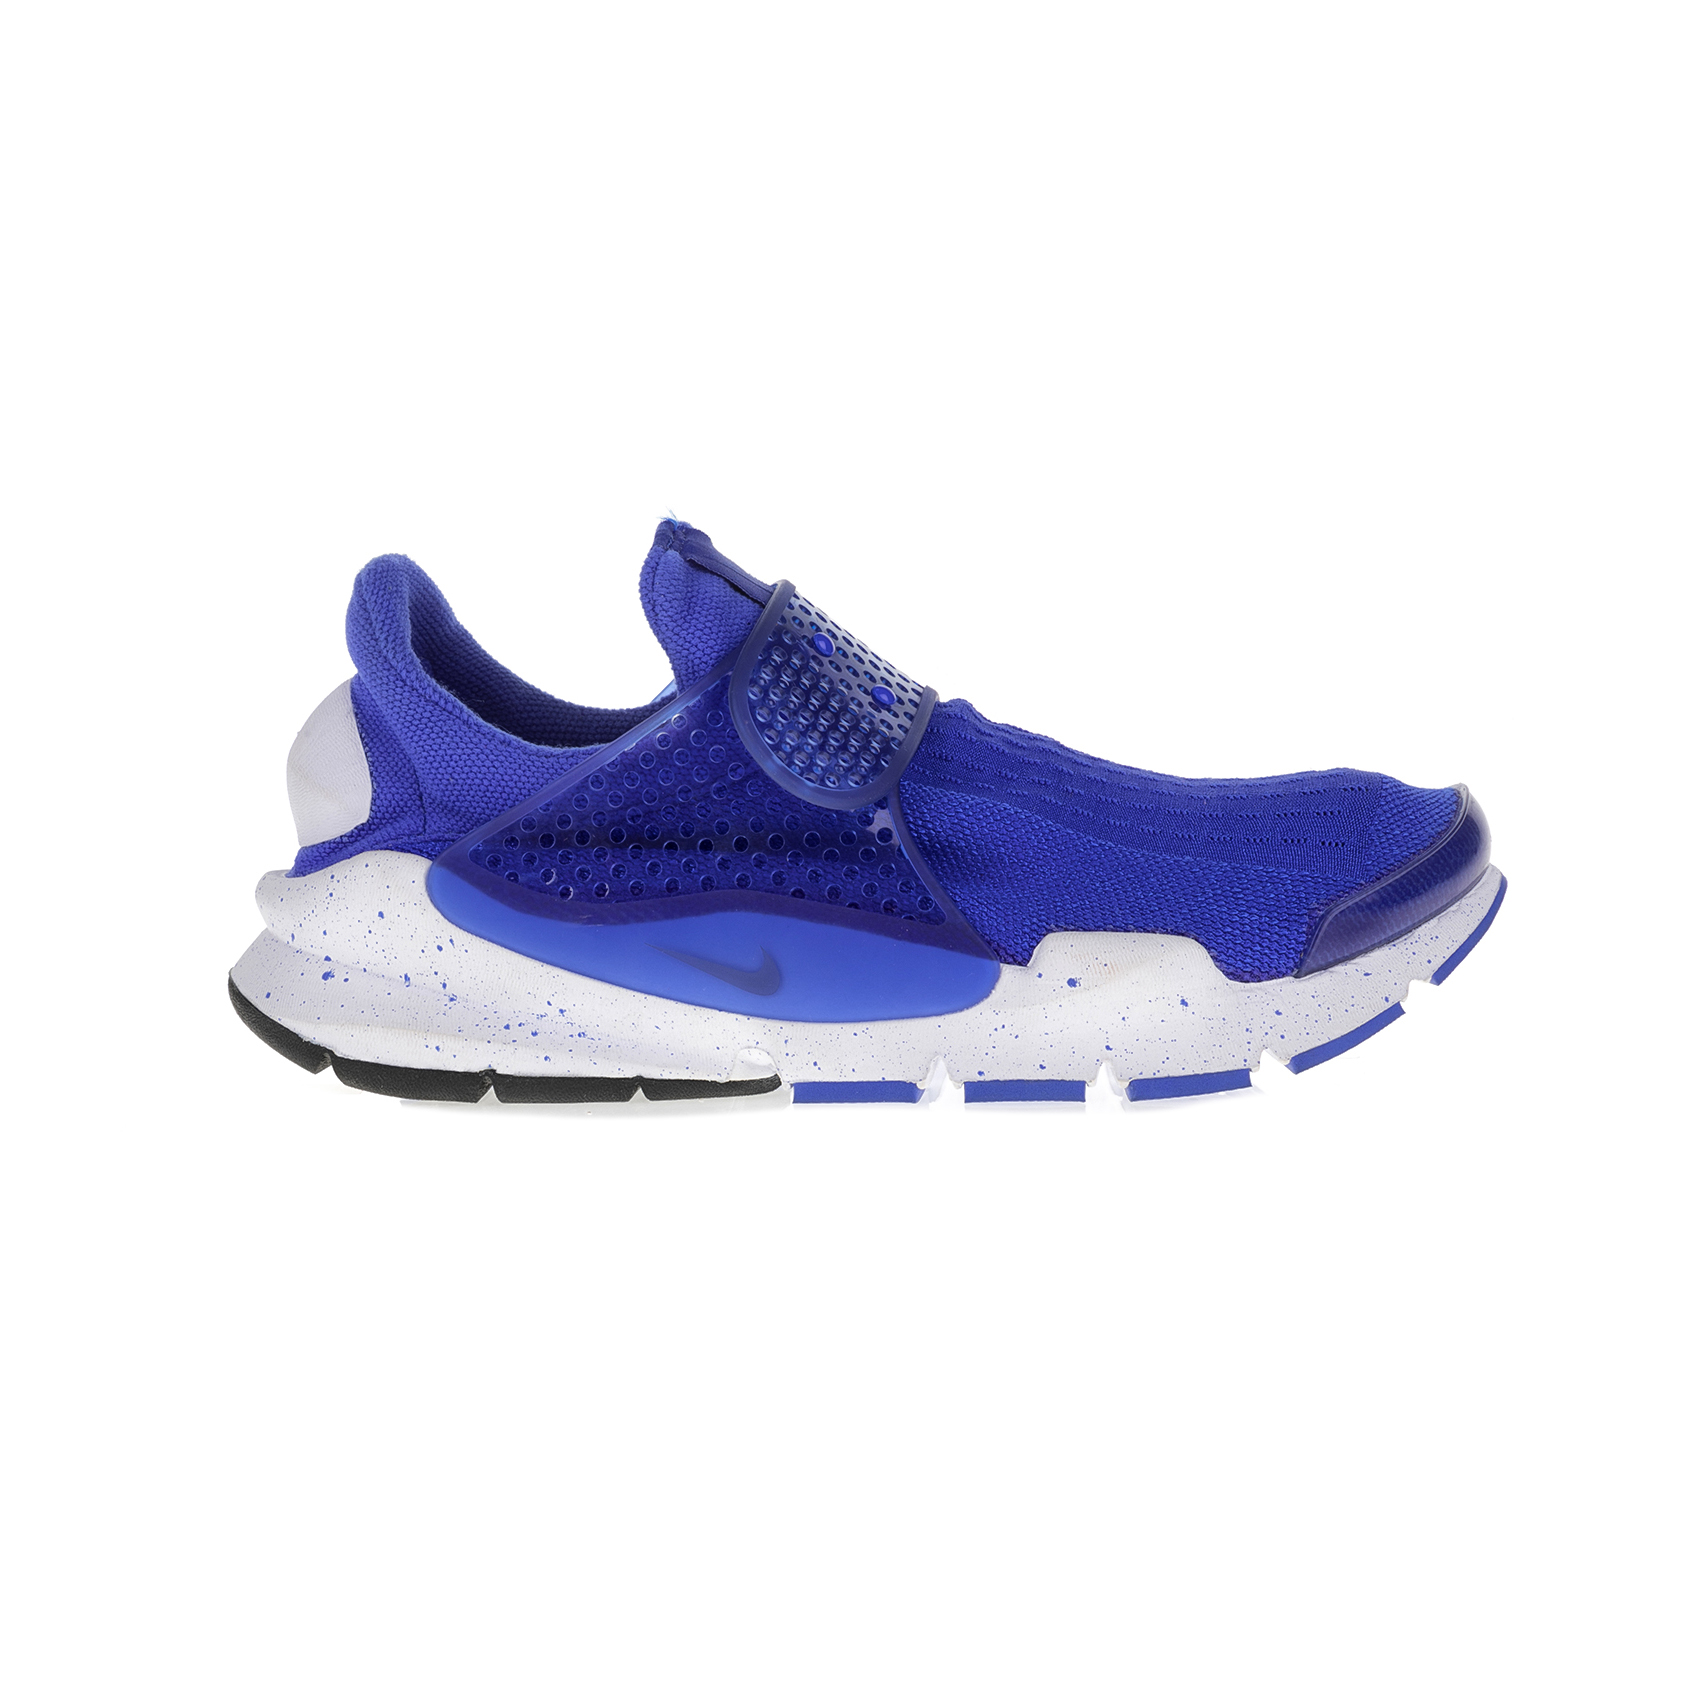 NIKE – Ανδρικά αθλητικά παπούτσια Nike SOCK DART SE μπλε